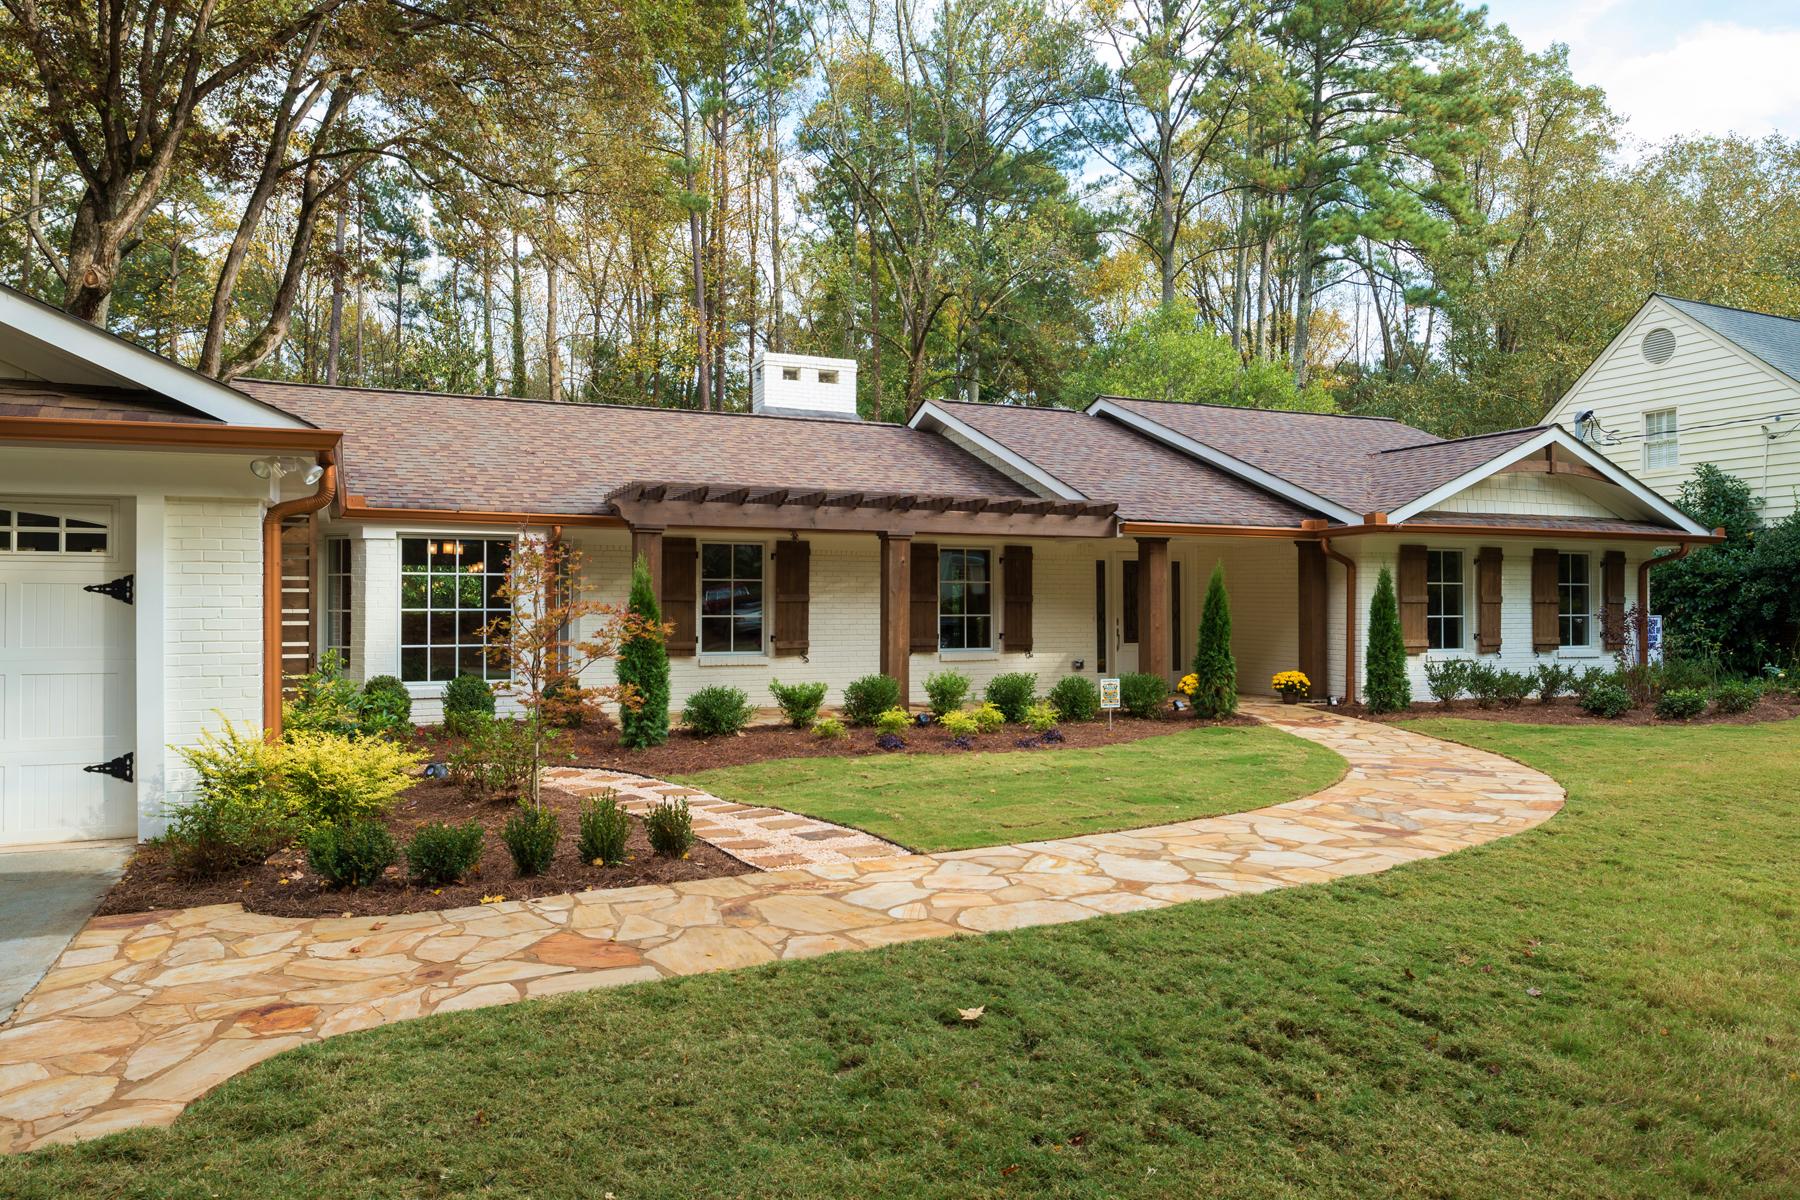 Частный односемейный дом для того Продажа на Newly Completed Midcentury Style In Park-Like Buckhead Setting 3192 Rockingham Drive Buckhead, Atlanta, Джорджия 30327 Соединенные Штаты